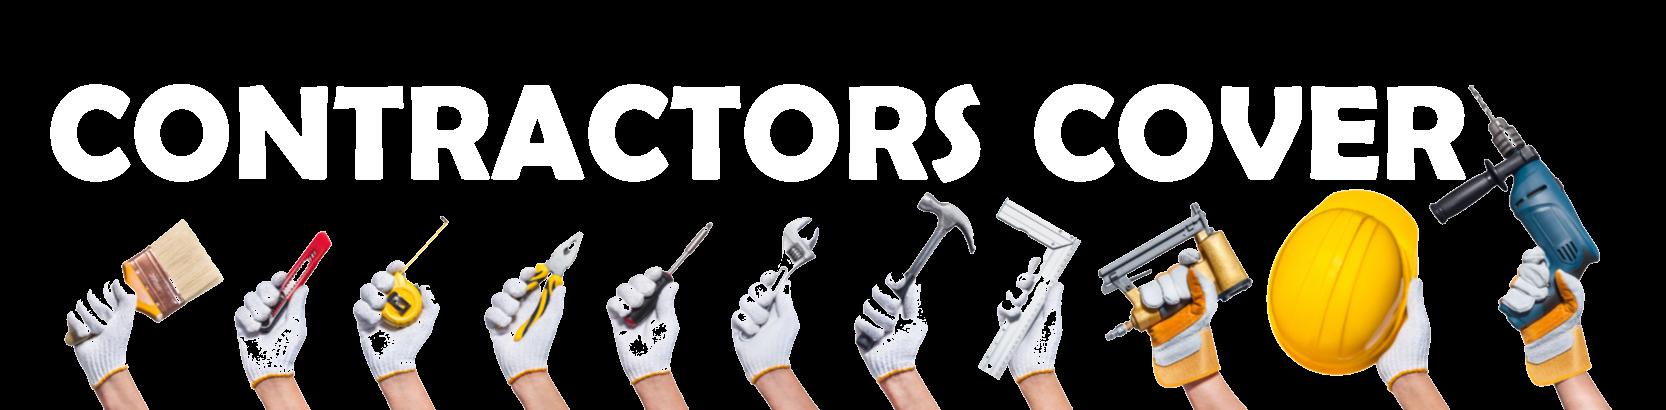 Contractors Cover